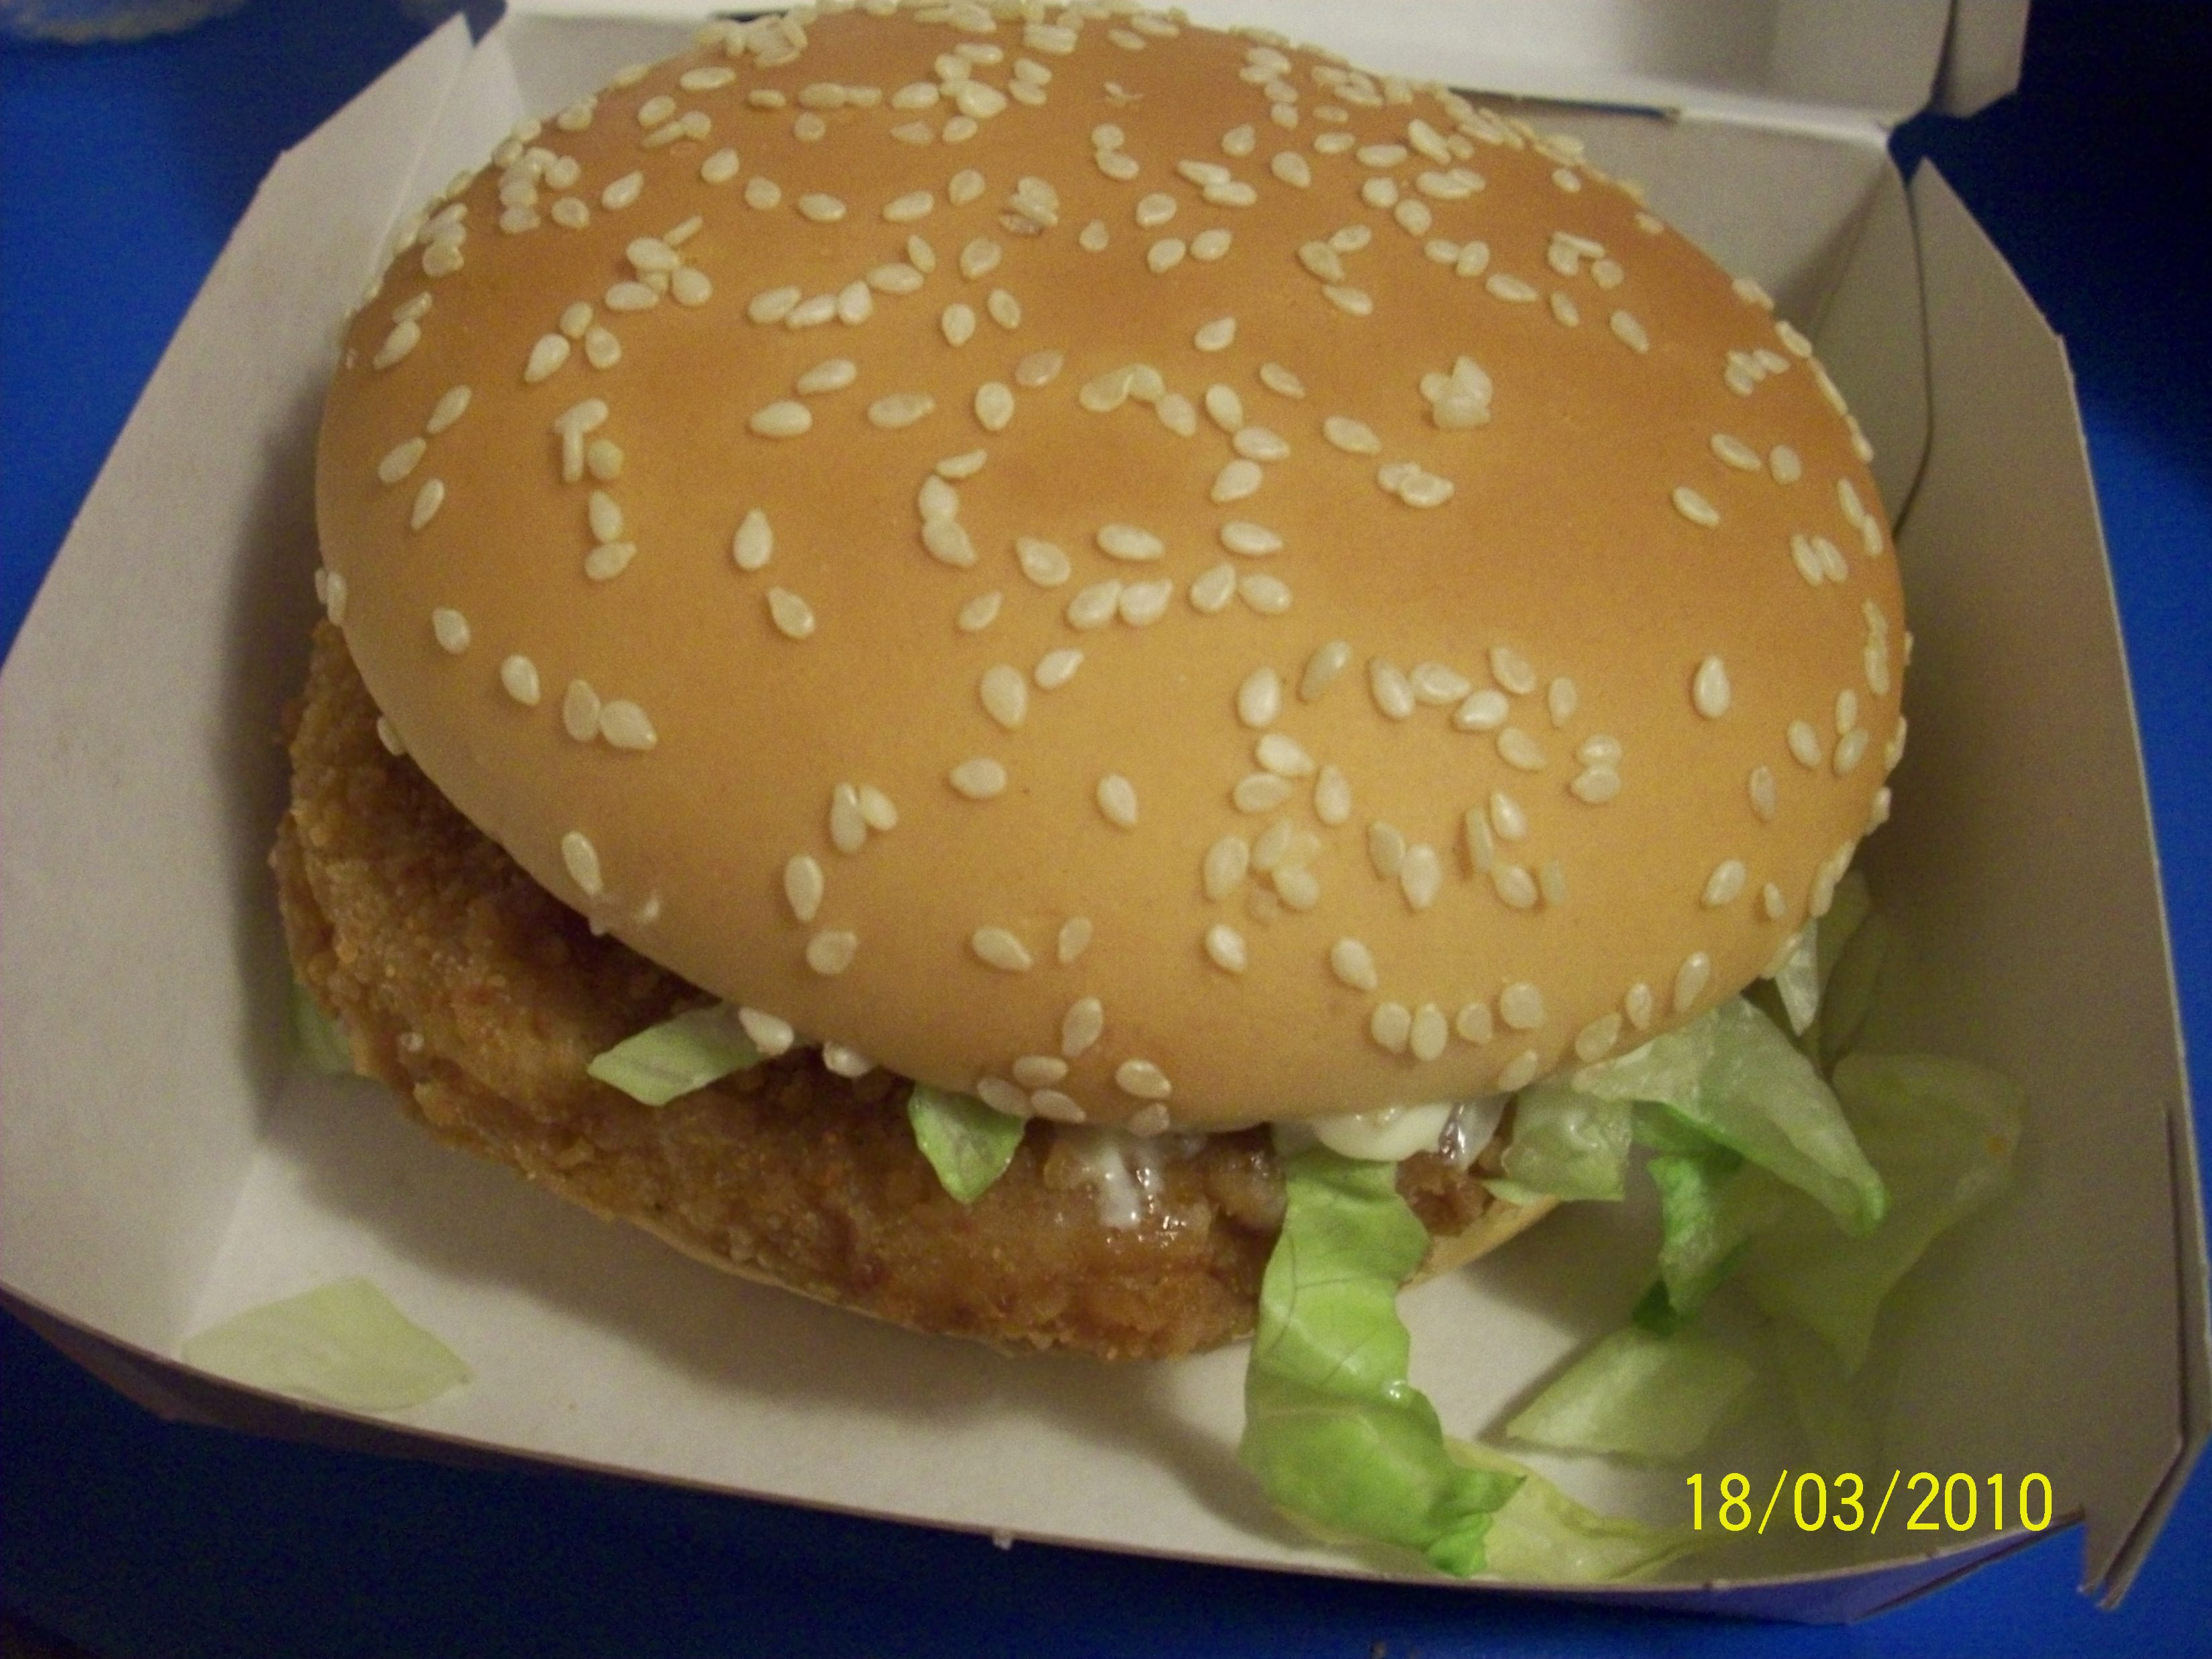 http://foodloader.net/cutie_2010-03-18_McChicken_Burger.jpg